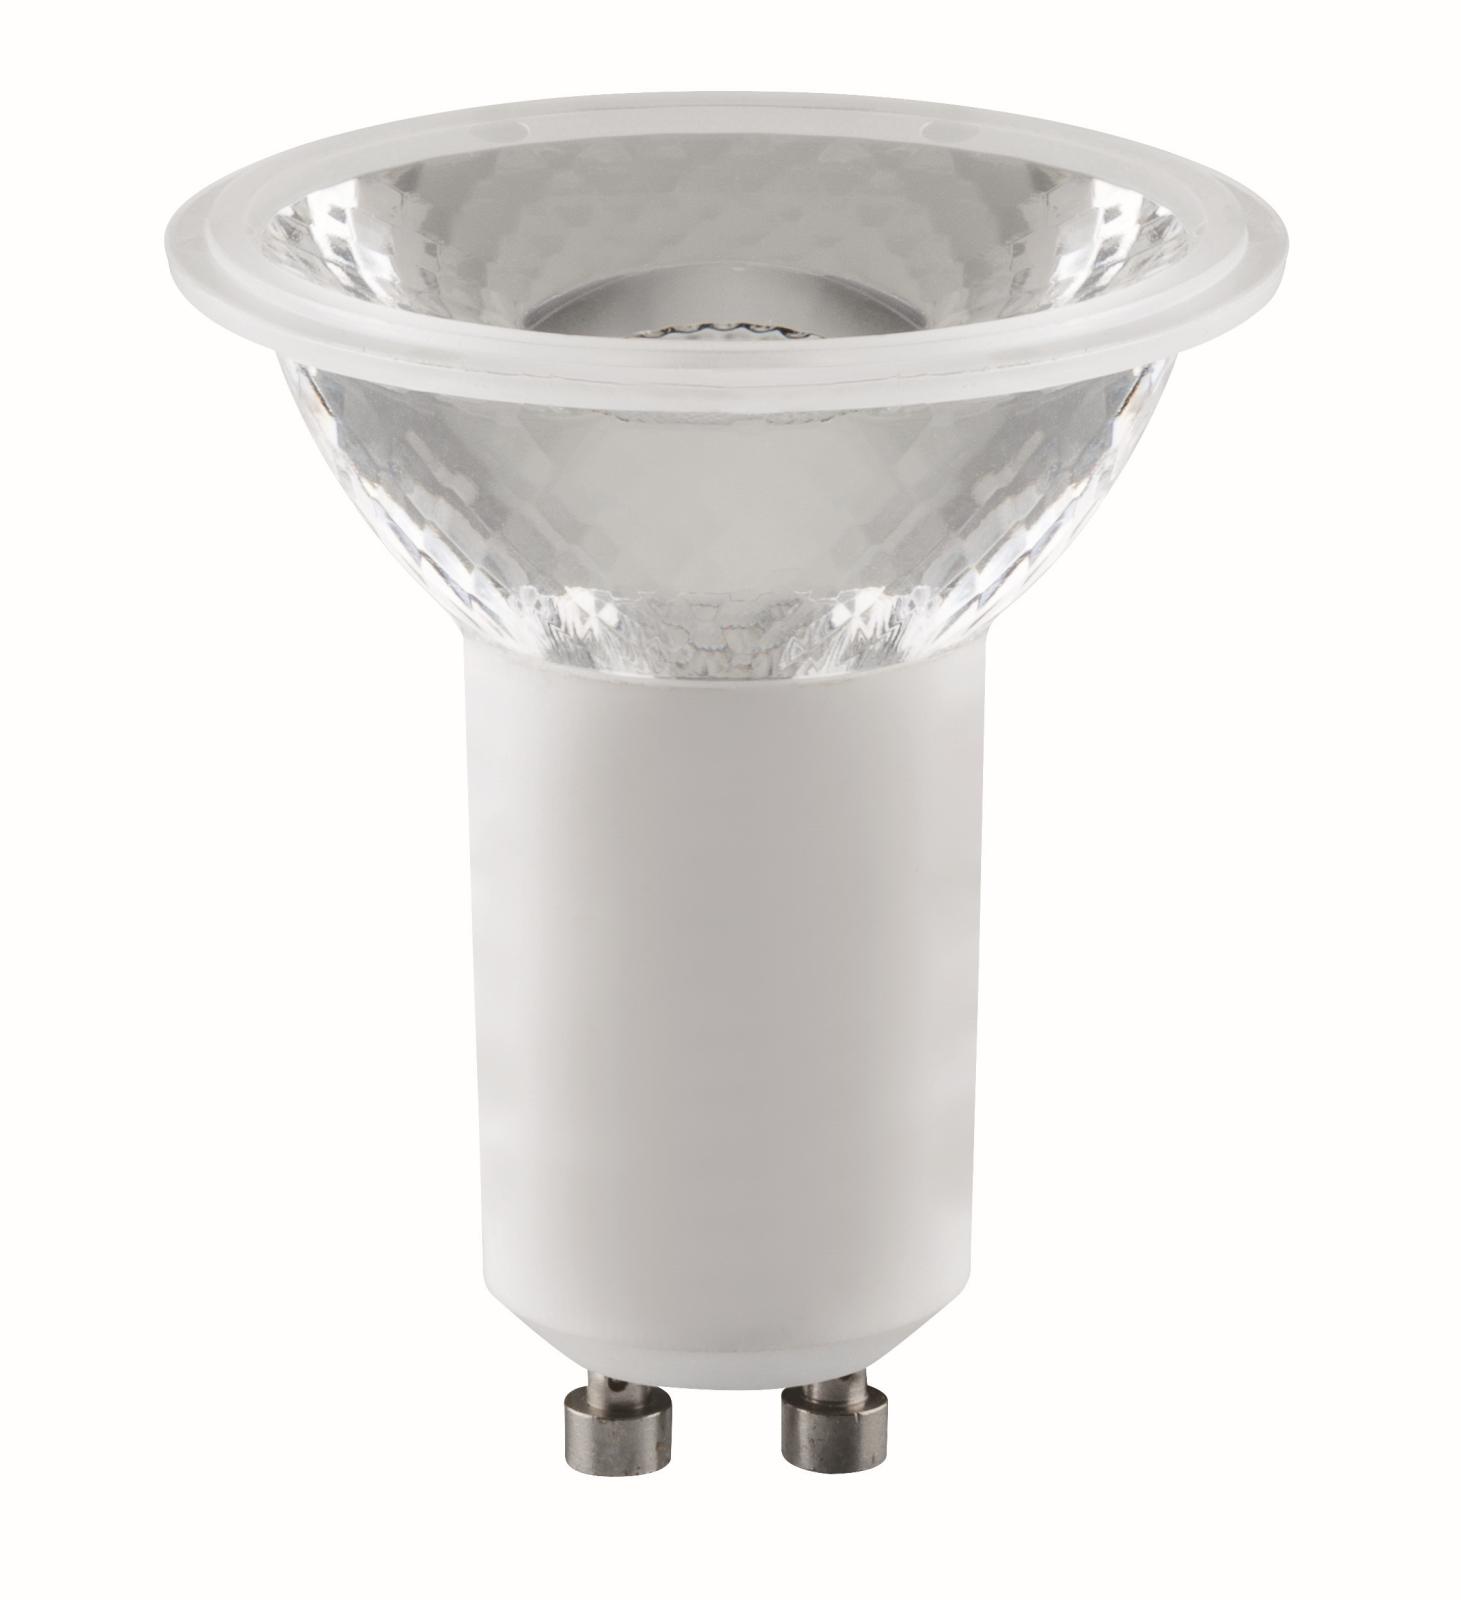 paulmann led diamond longneck 3w gu10 2700k. Black Bedroom Furniture Sets. Home Design Ideas